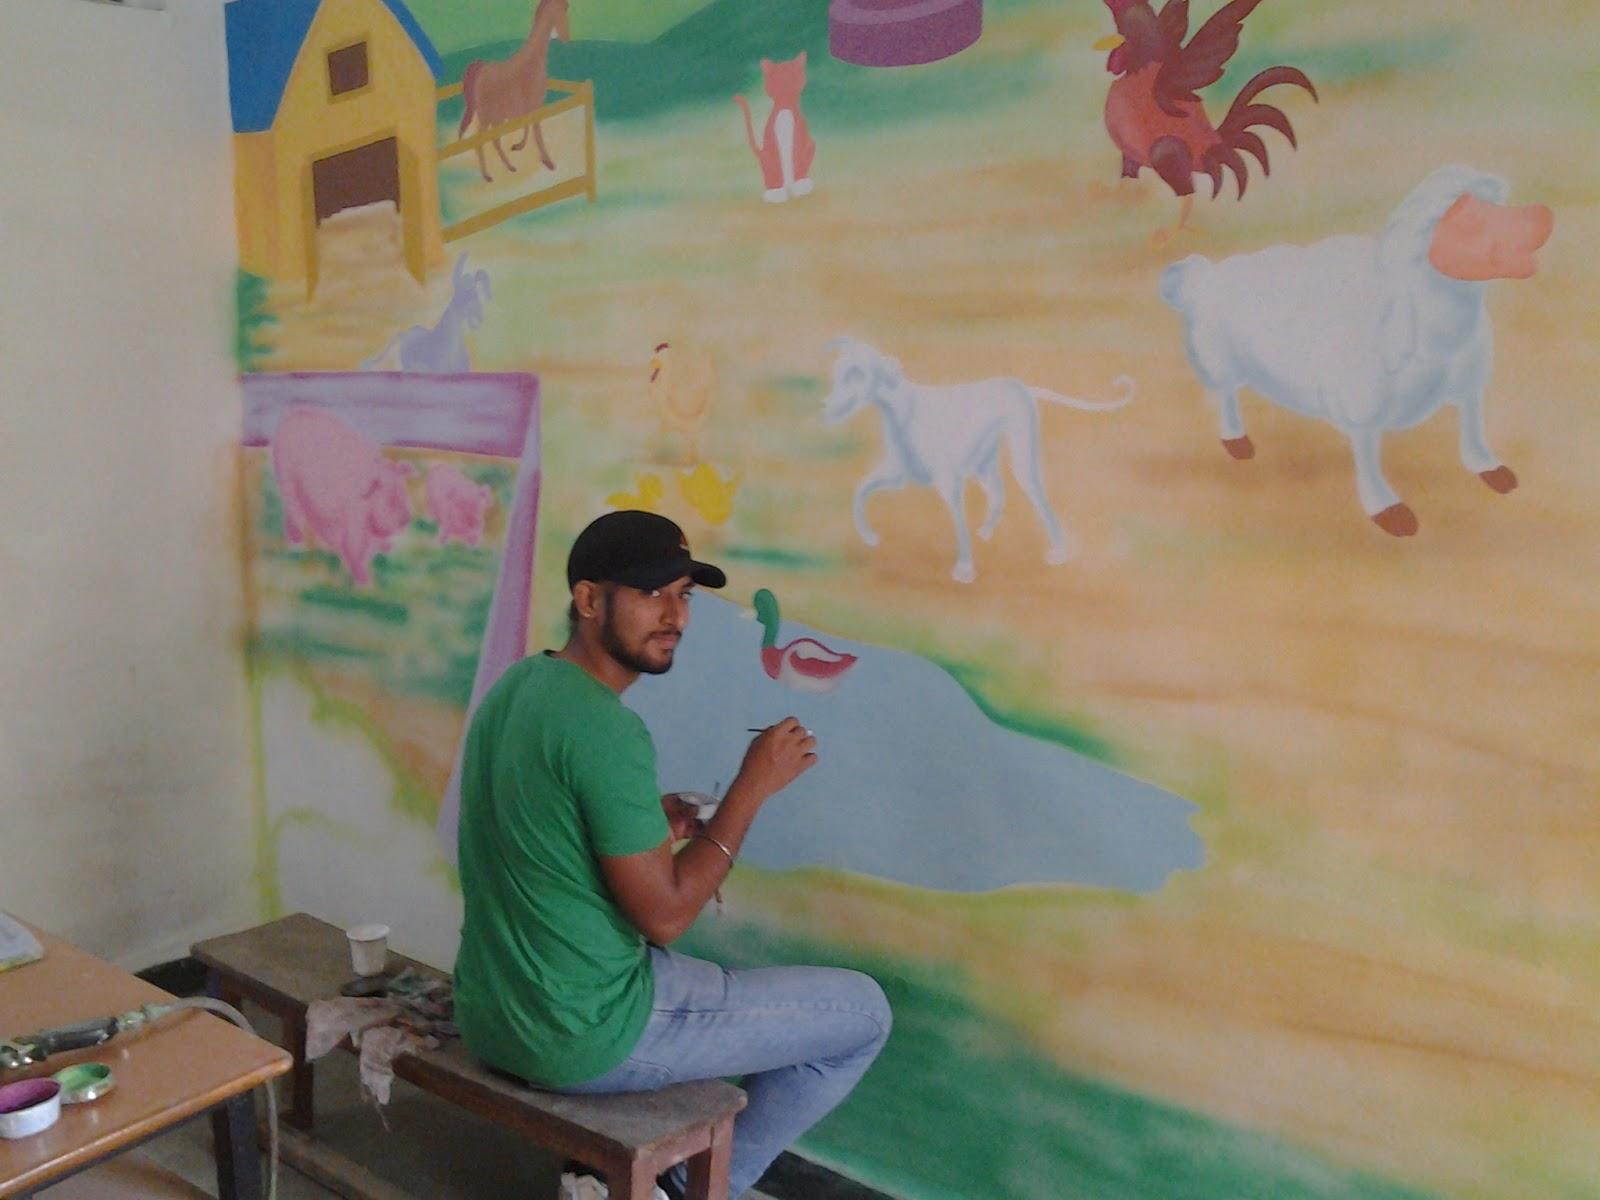 Kids school classroom wall murals andheri santakruz for Classroom wall mural